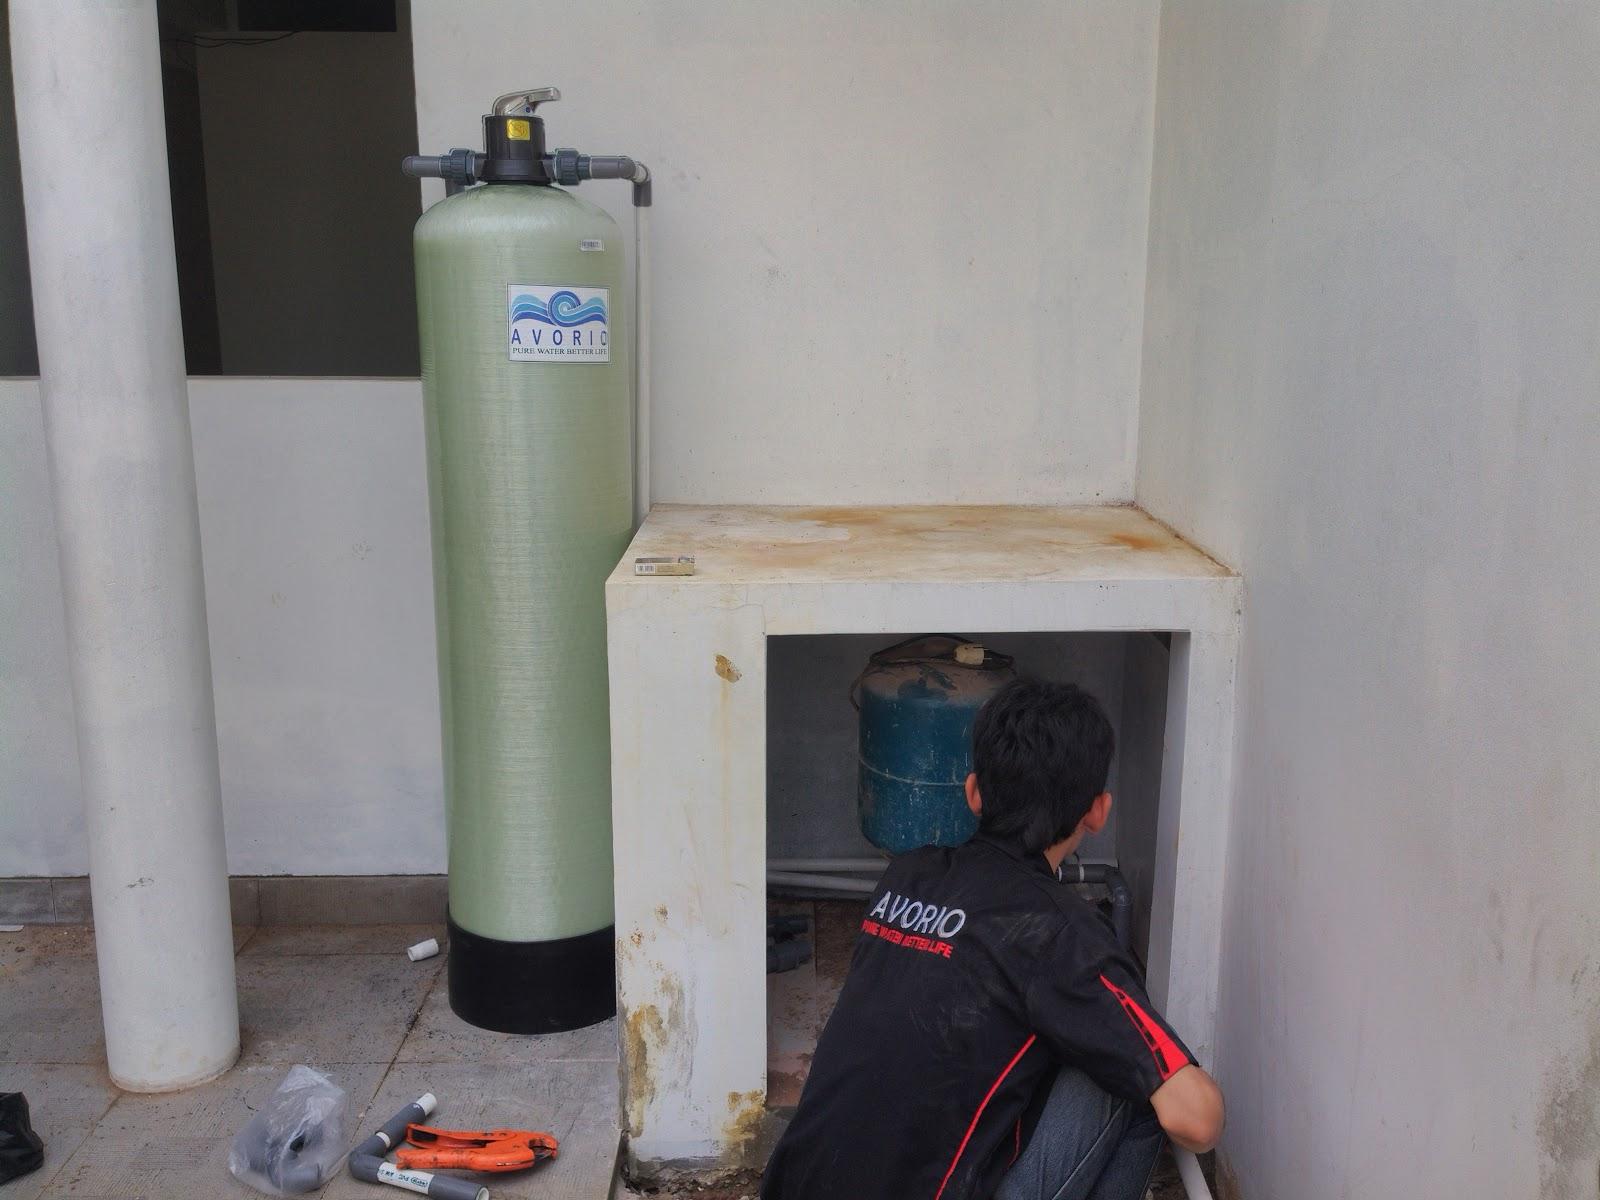 Filter Penjernih Air Depok, Tangerang, Bekasi, Bogor, Depok, Jakarta, Bandung. Air tanah sumur bor halal, garansi